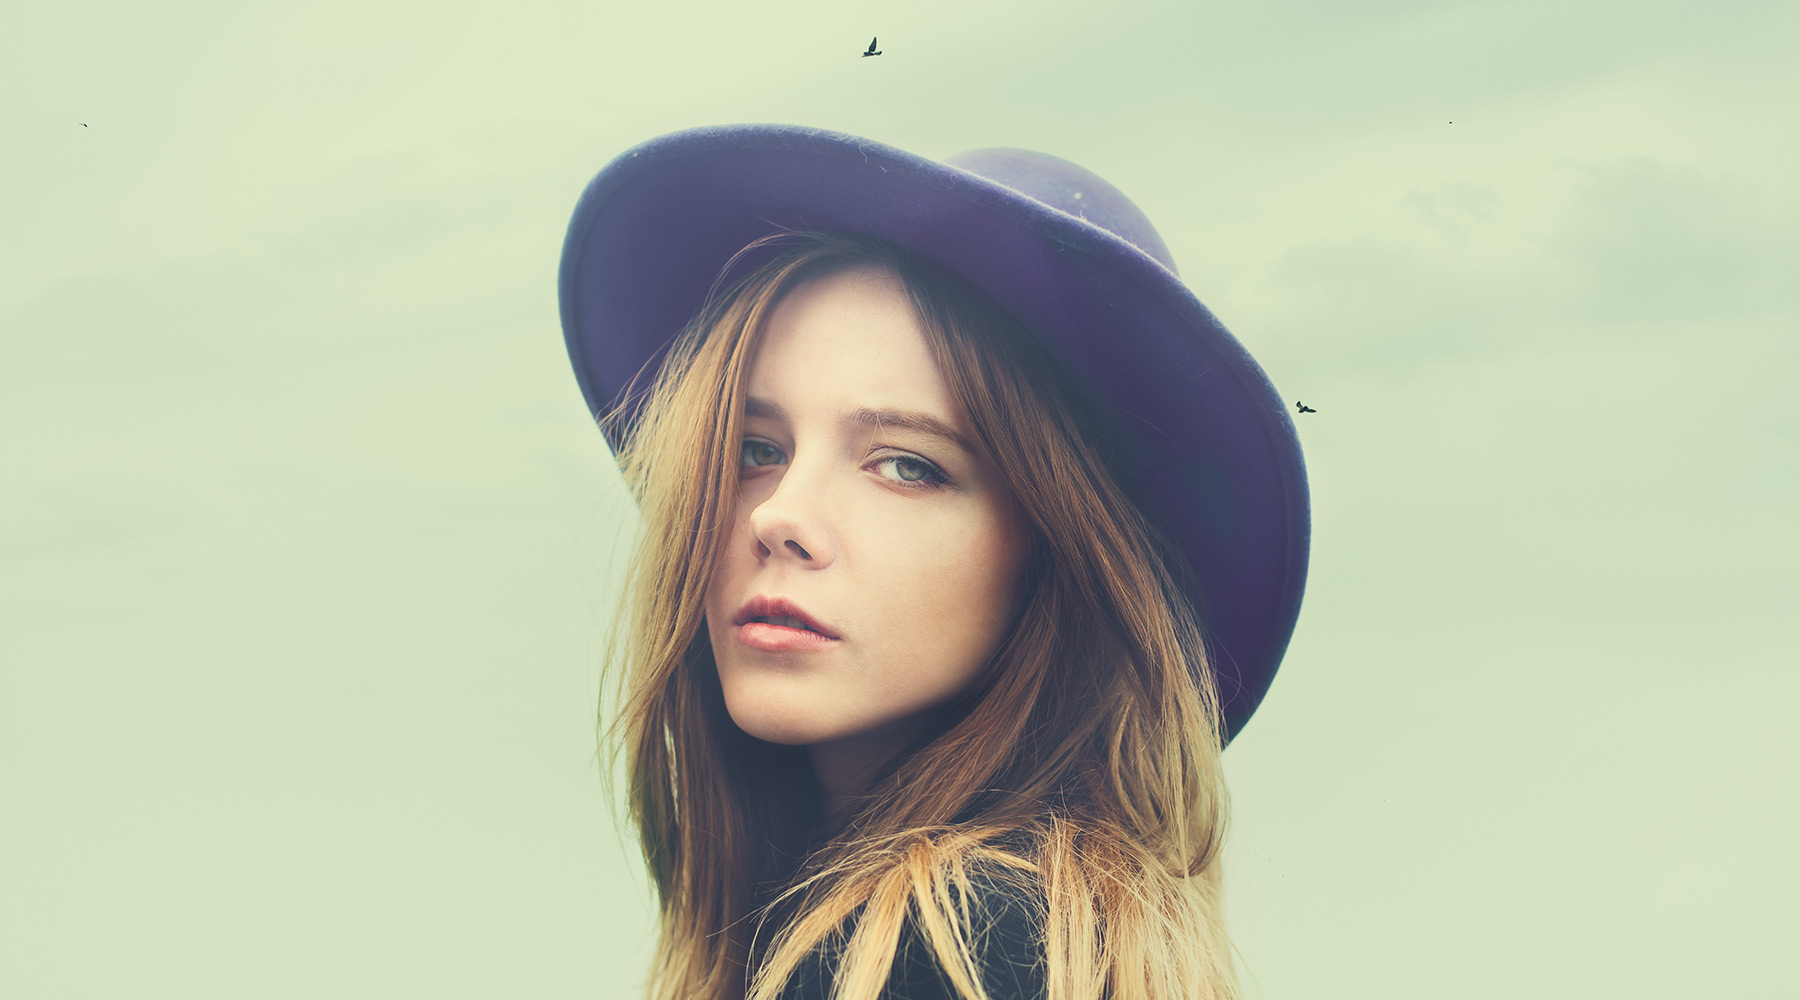 lady-in-hat